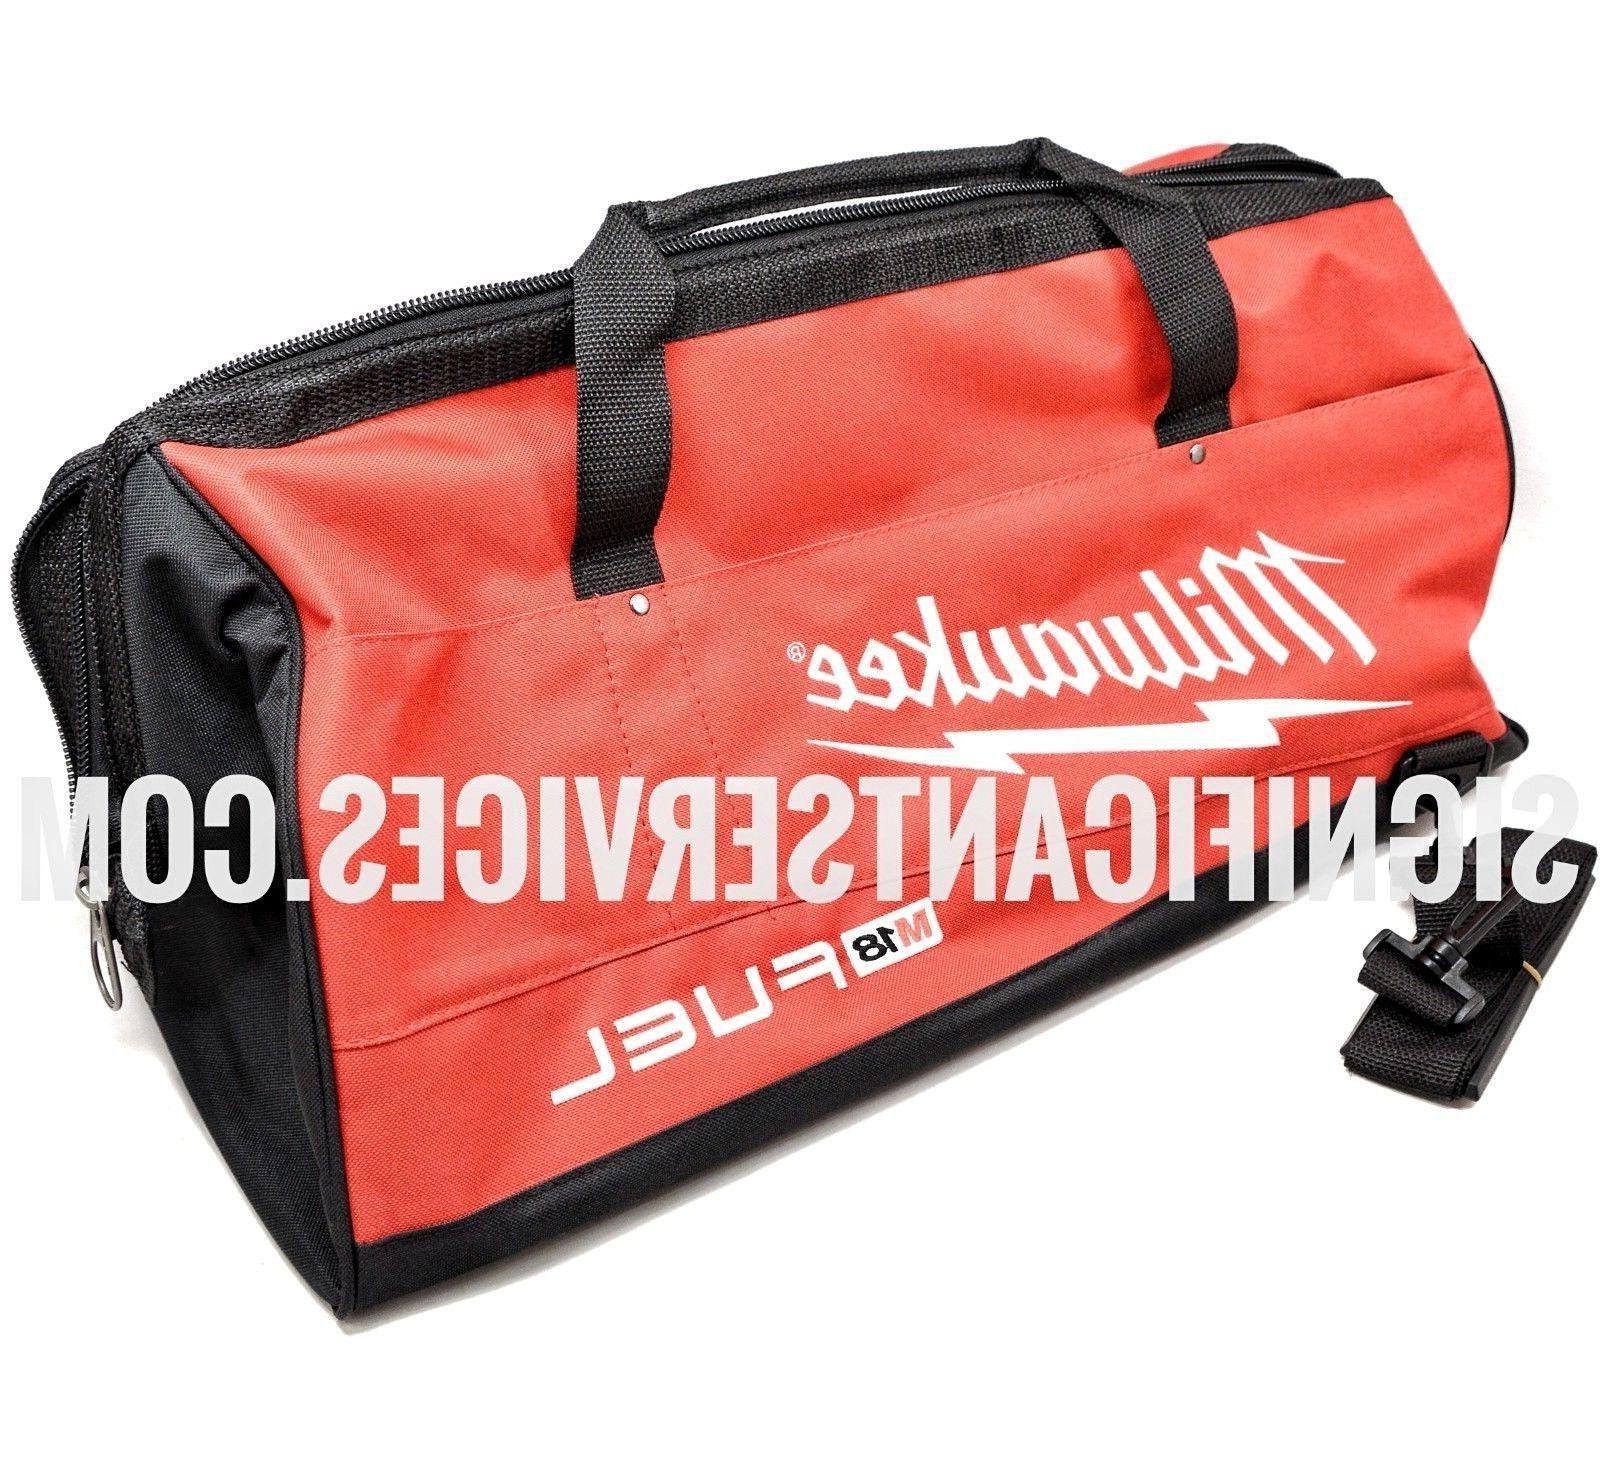 m18 fuel heavy duty large bag tool